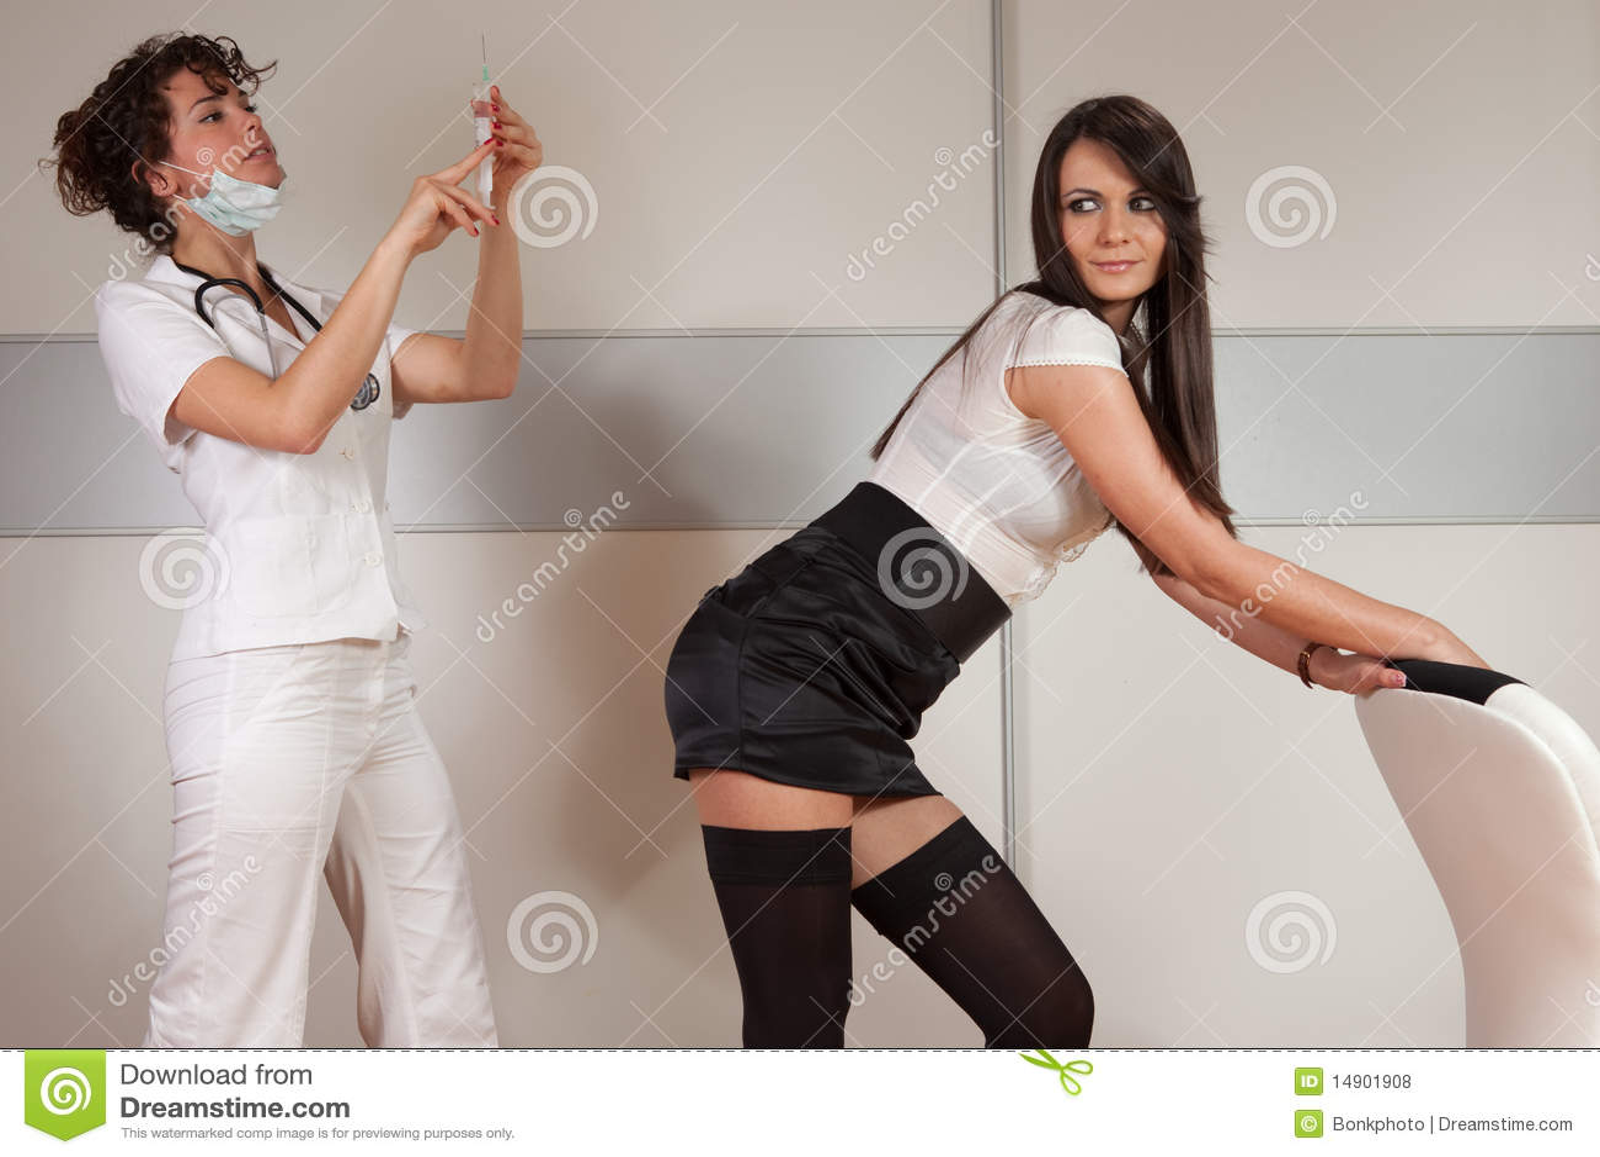 Sexy lesbian nurse upskirt examination